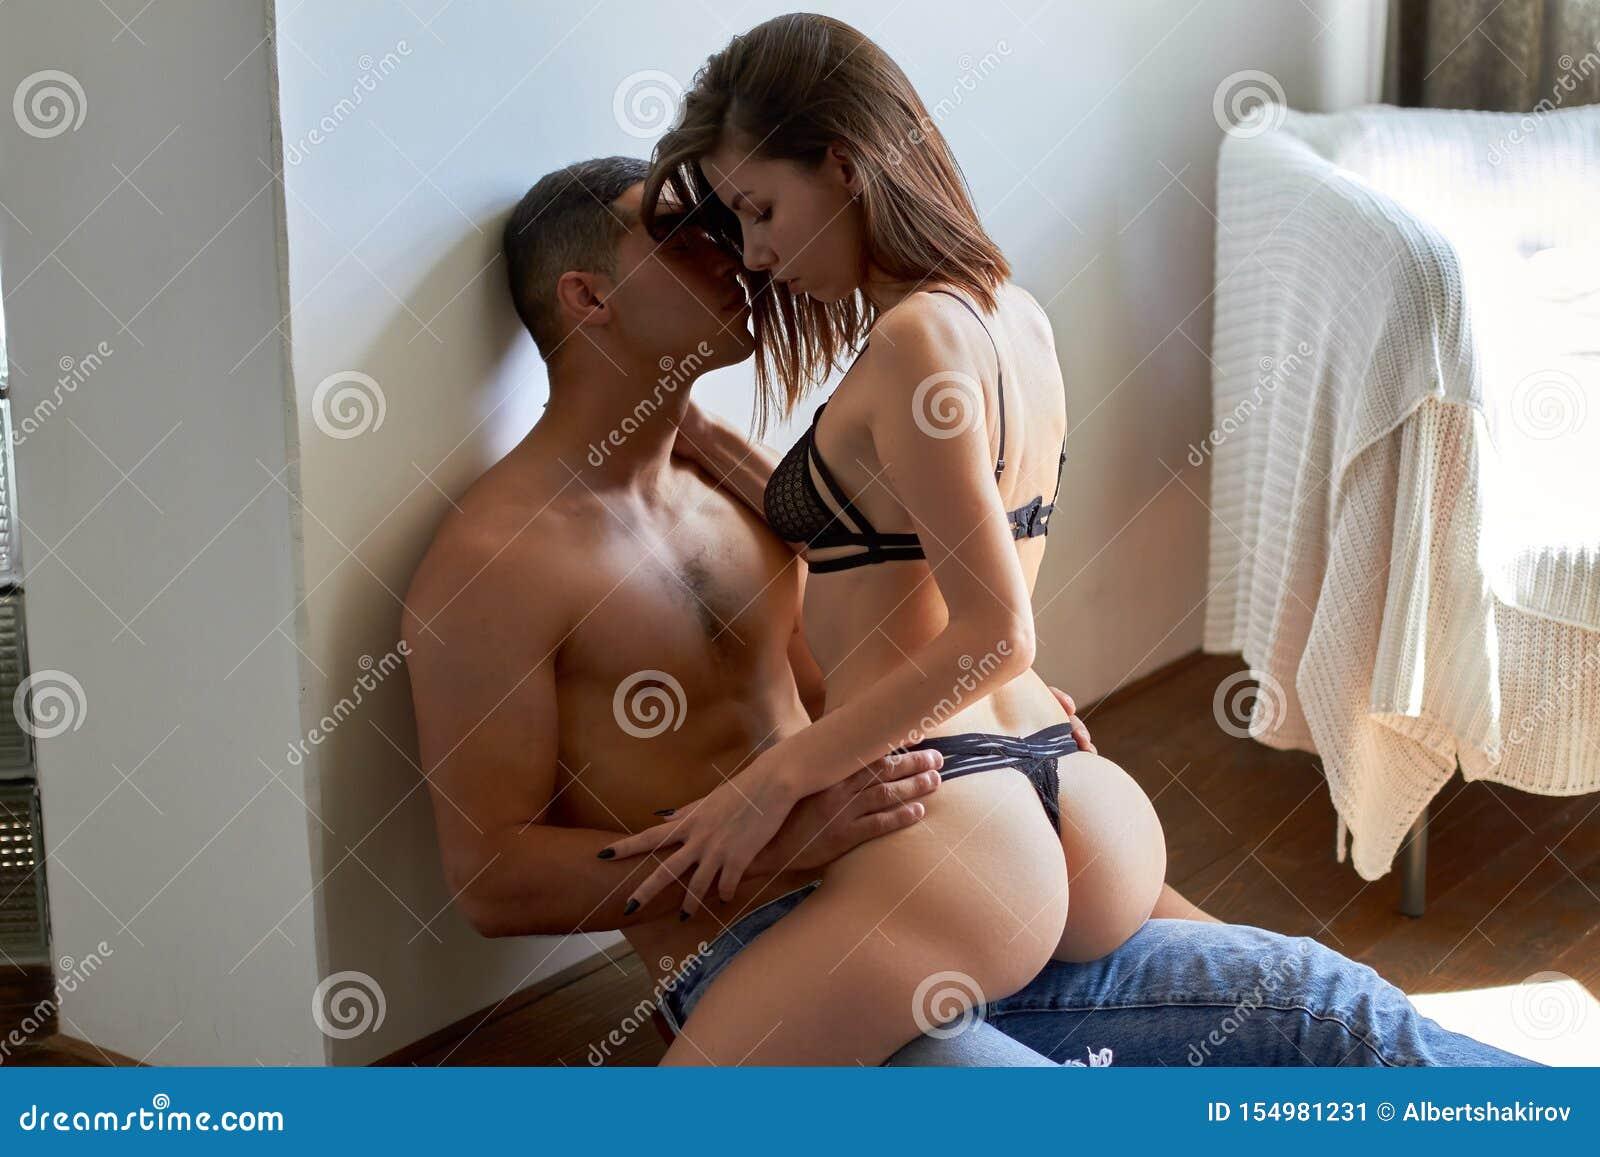 Having Sex Against Wall